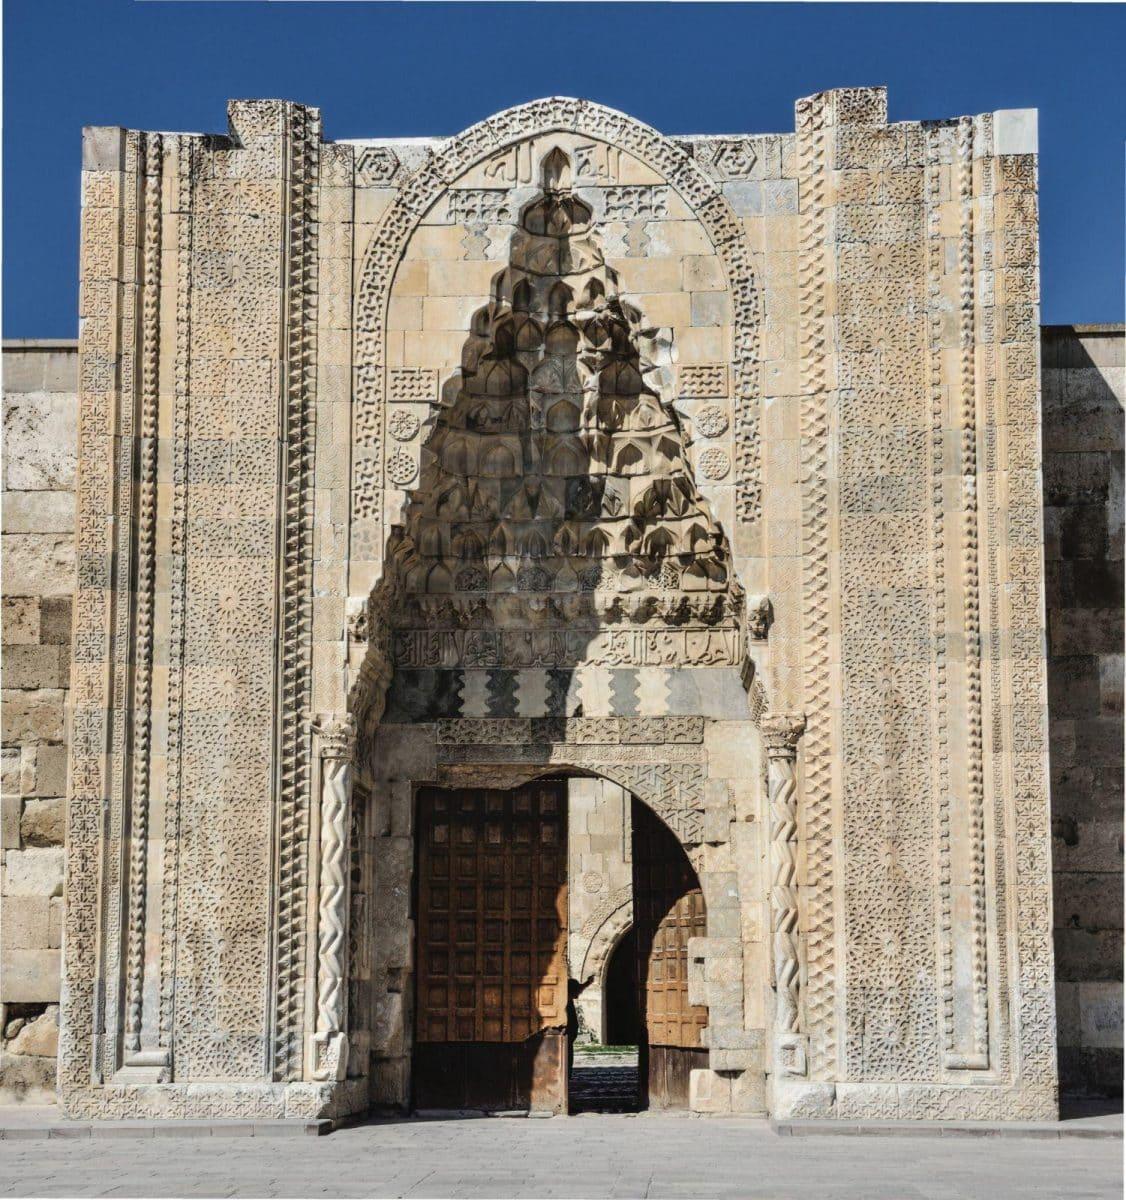 Arsitektur Sultanhani Caravanserai-Pintu Masuk